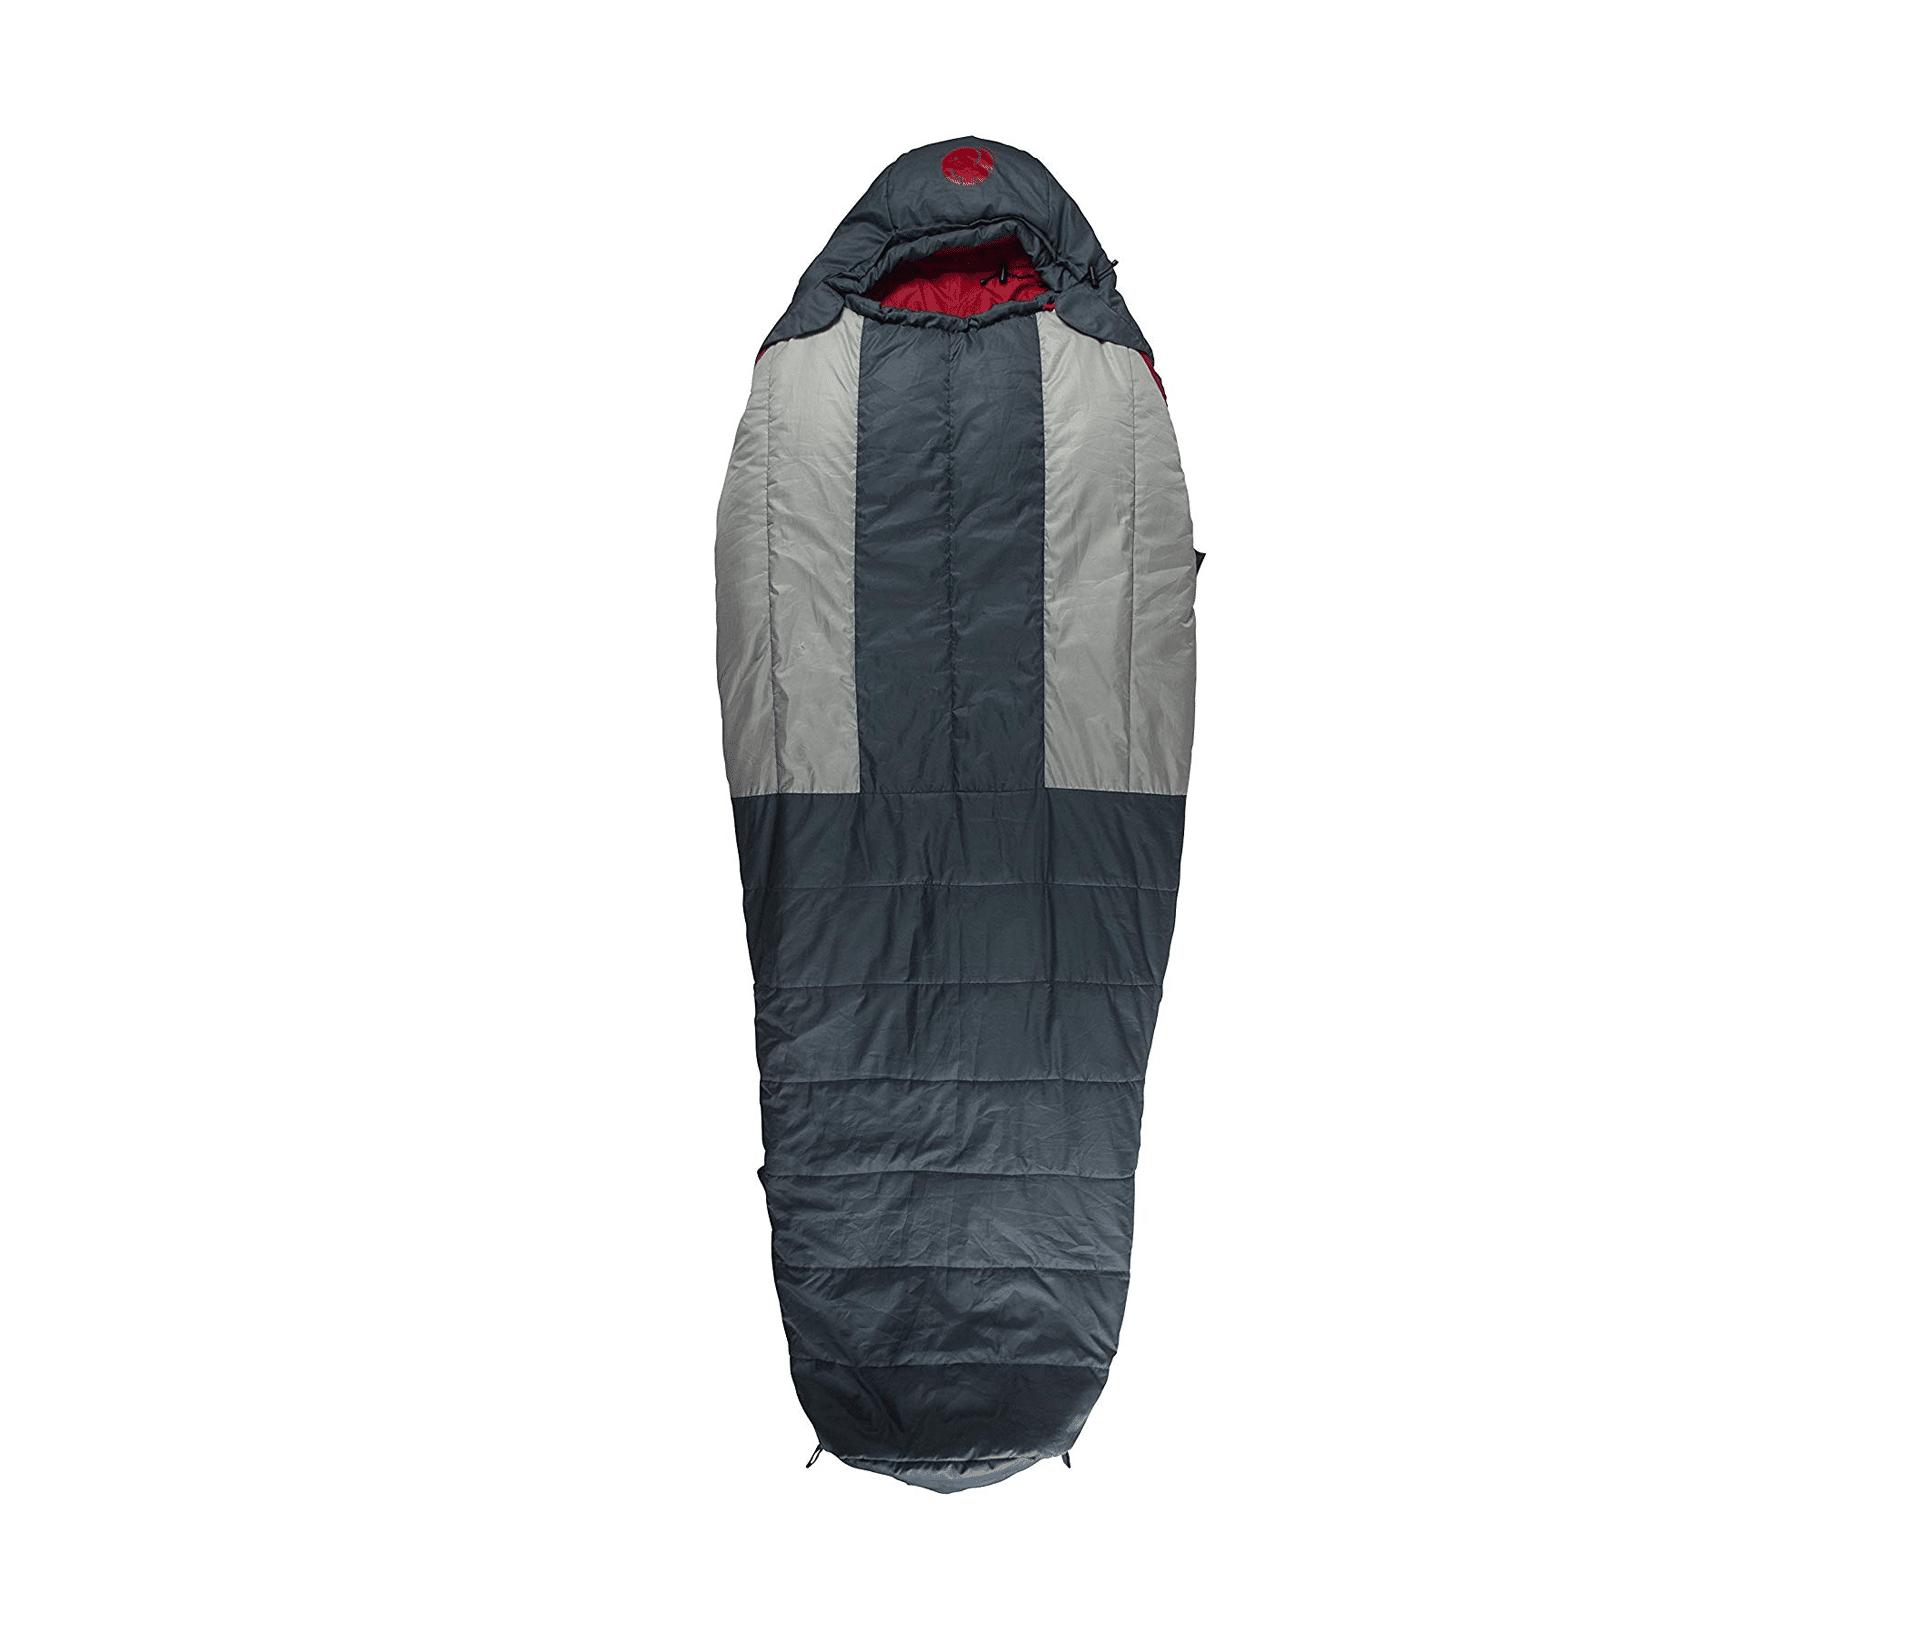 OmniCore Designs Mummy Sleeping Bag